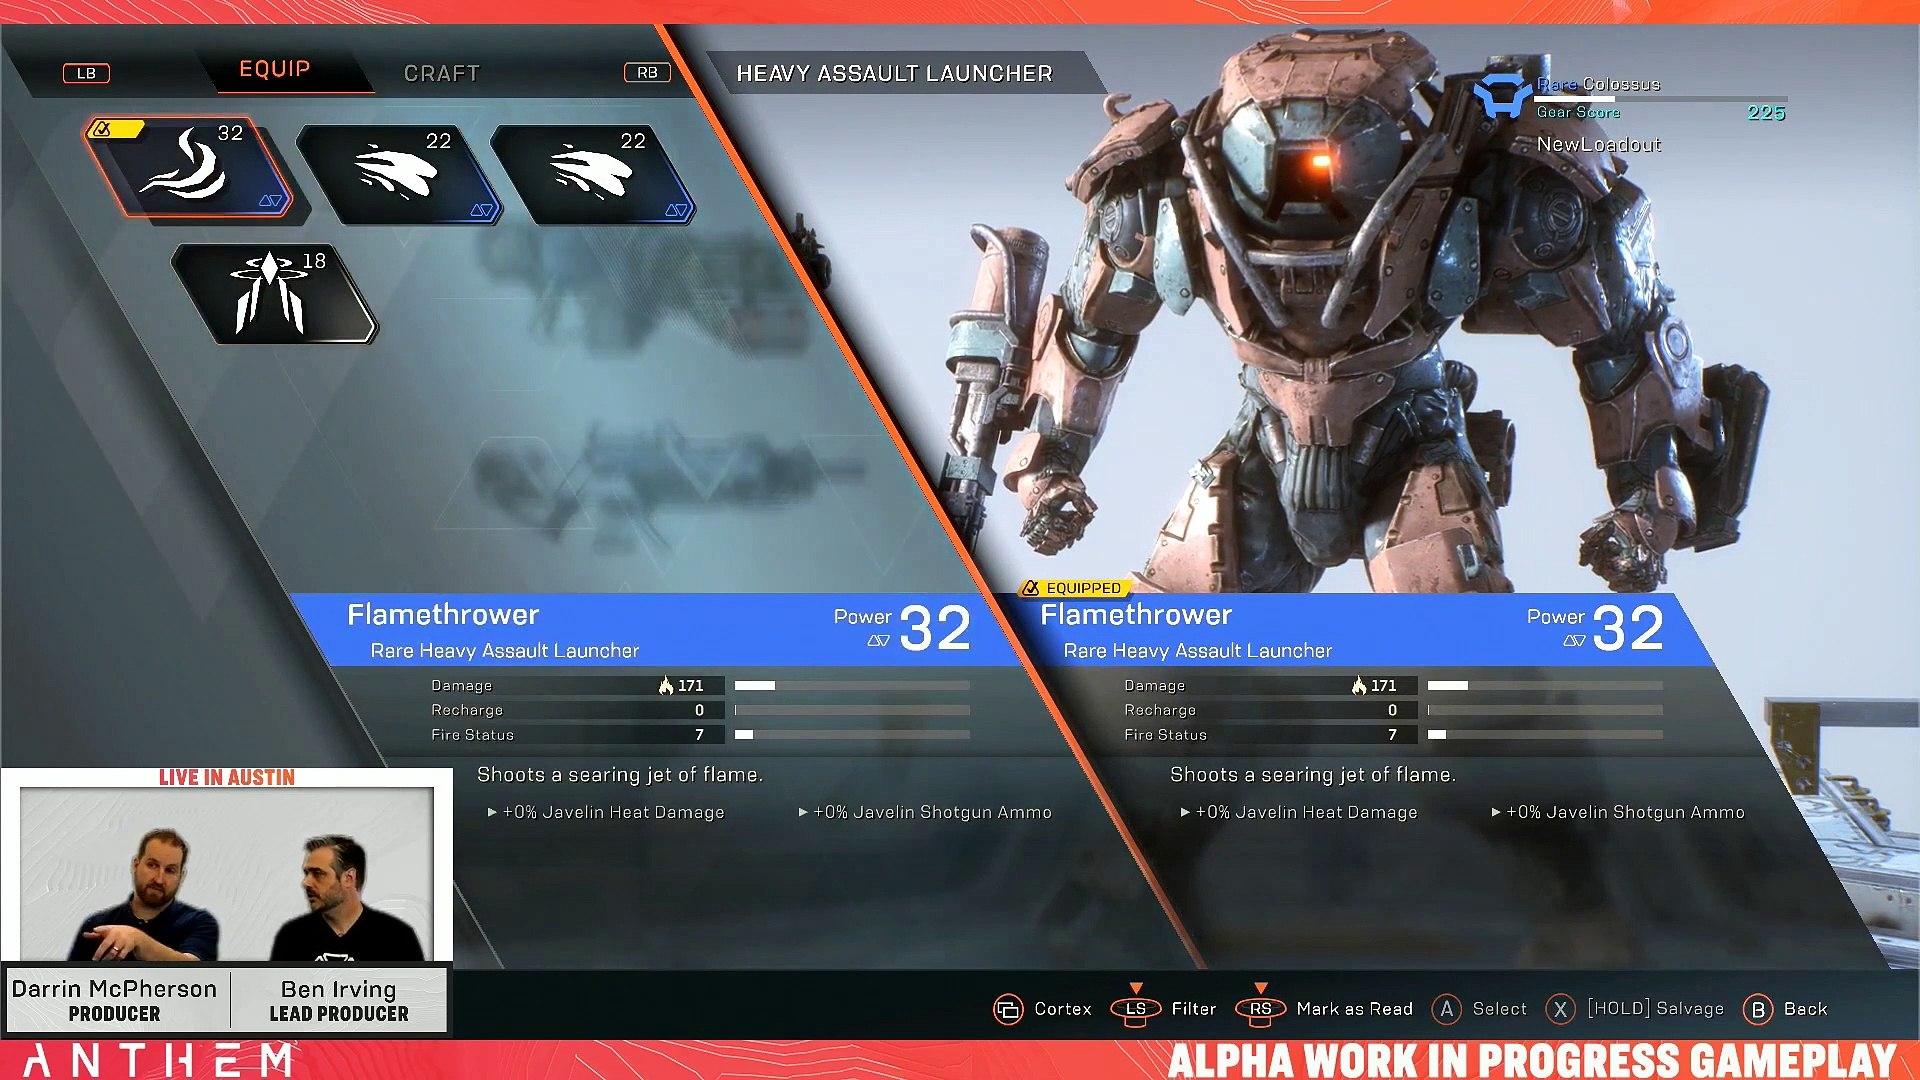 Anthem: Gear and Progression Gameplay - Anthem Developer Livestream from December 13